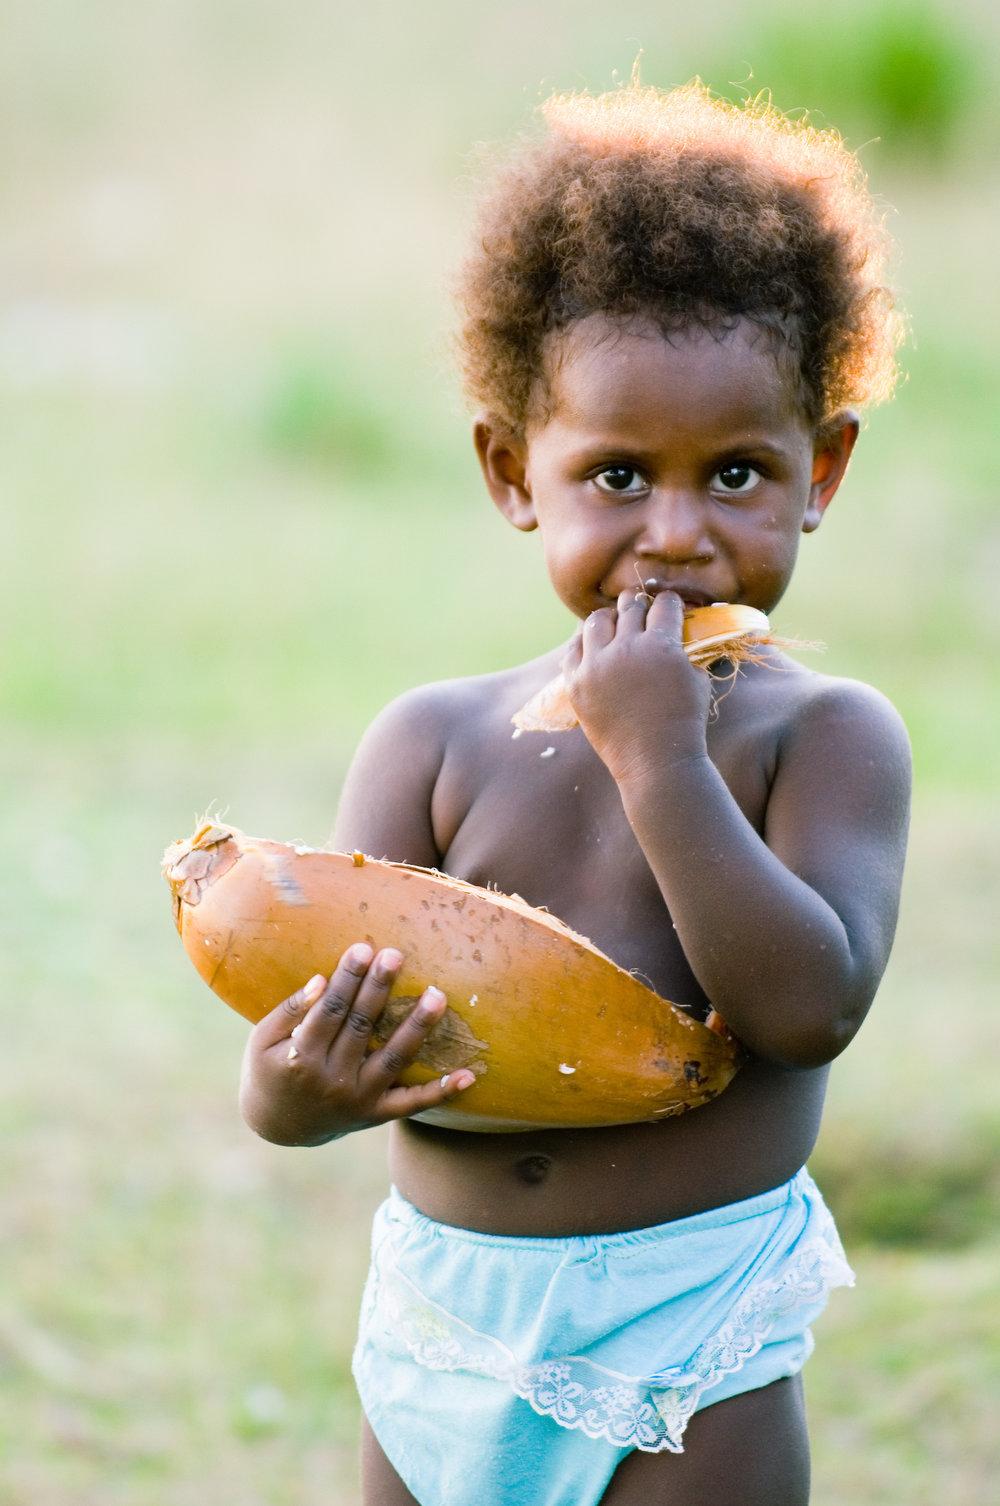 Arnavon_Islands_Solomons_019.jpg